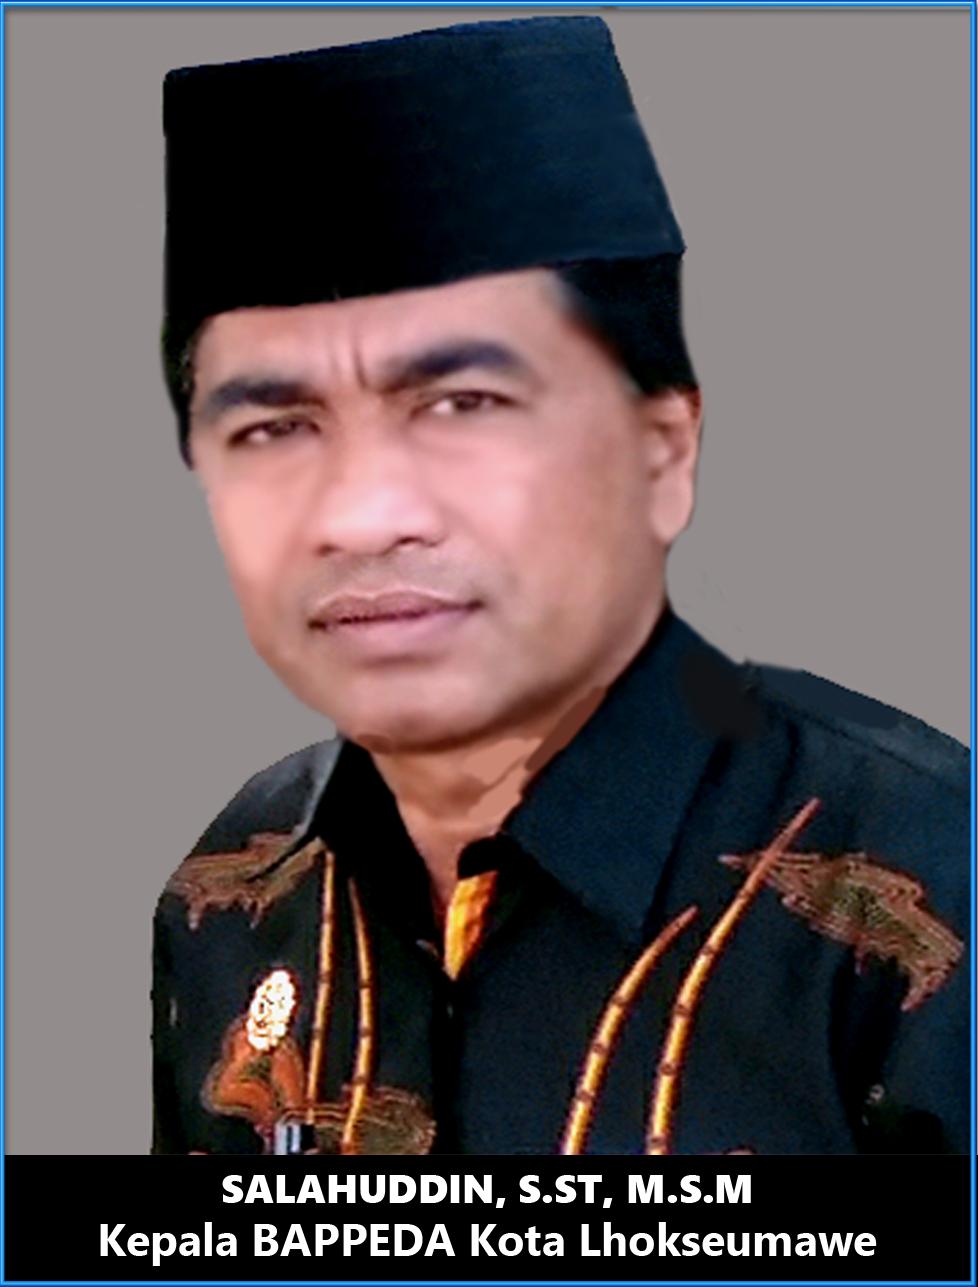 kepala Bappeda Kota Lhokseumawe